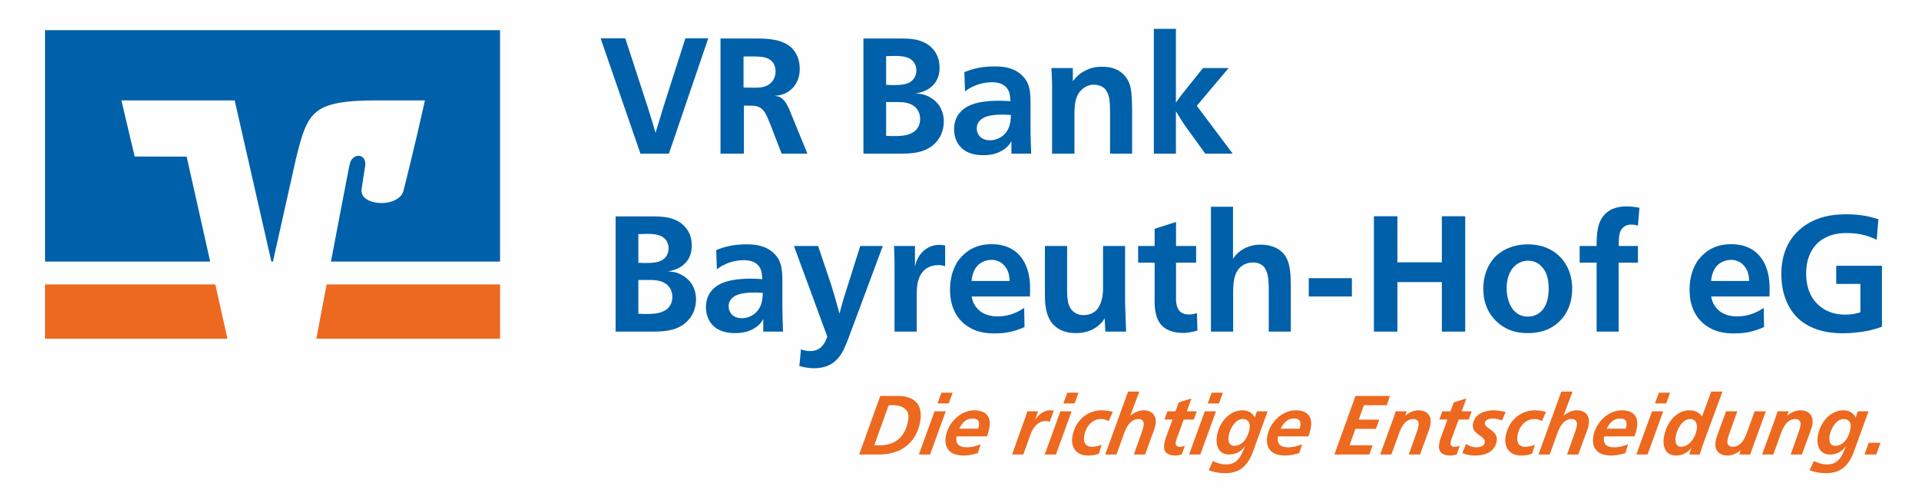 Vr Bank Bayreuth Hof Eg